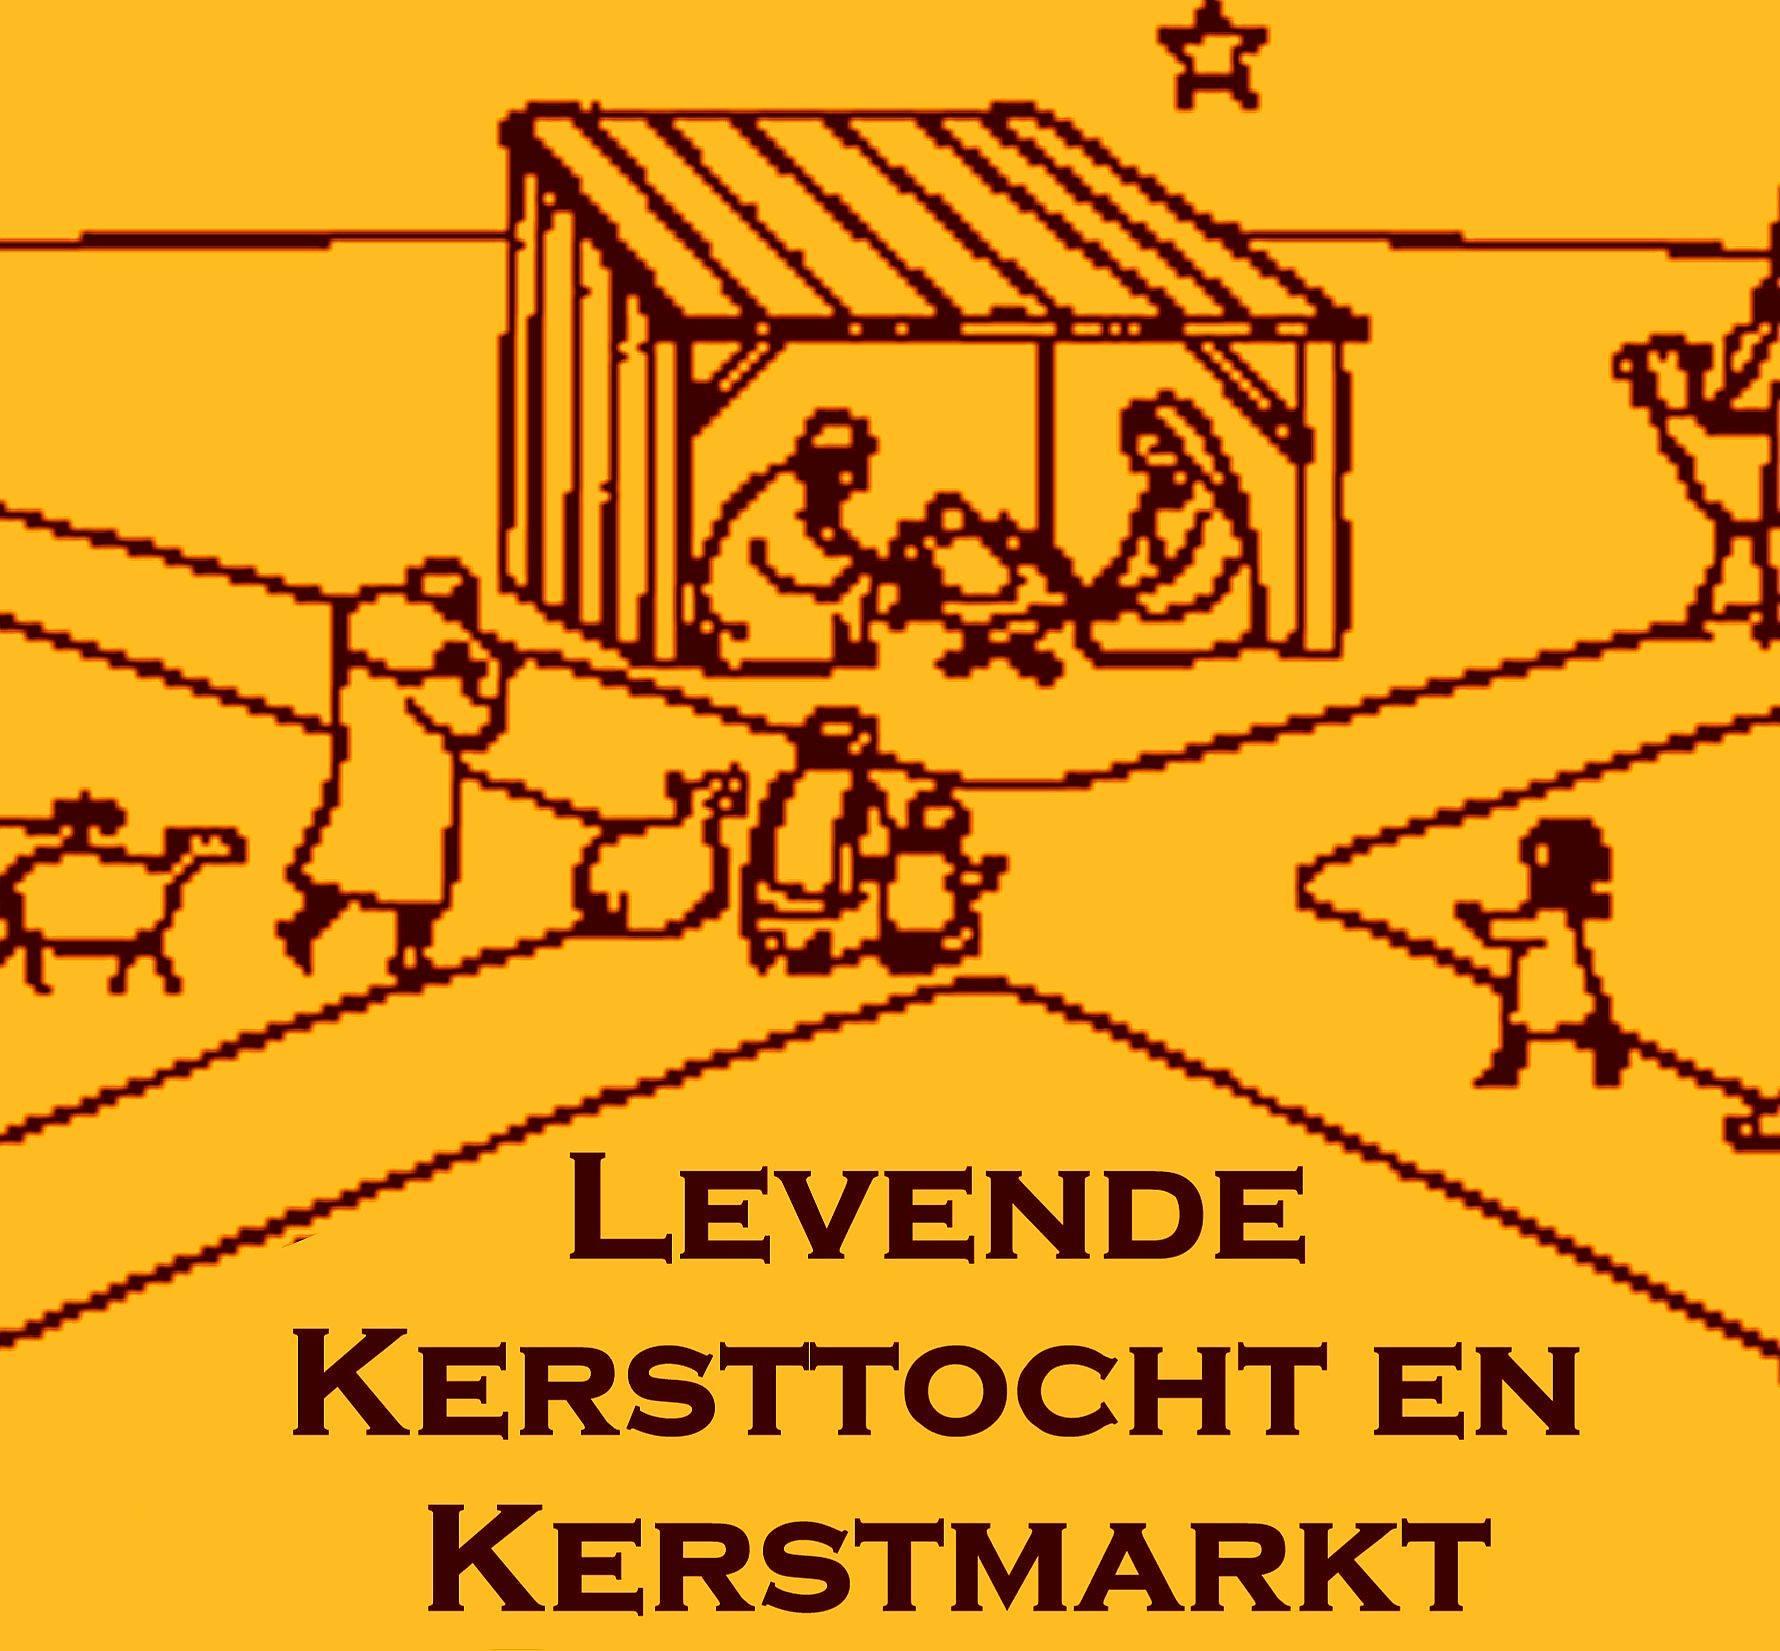 Studieorkest Op Kerstmarkt Klooster Graefenthal Afferden Limburg Nl